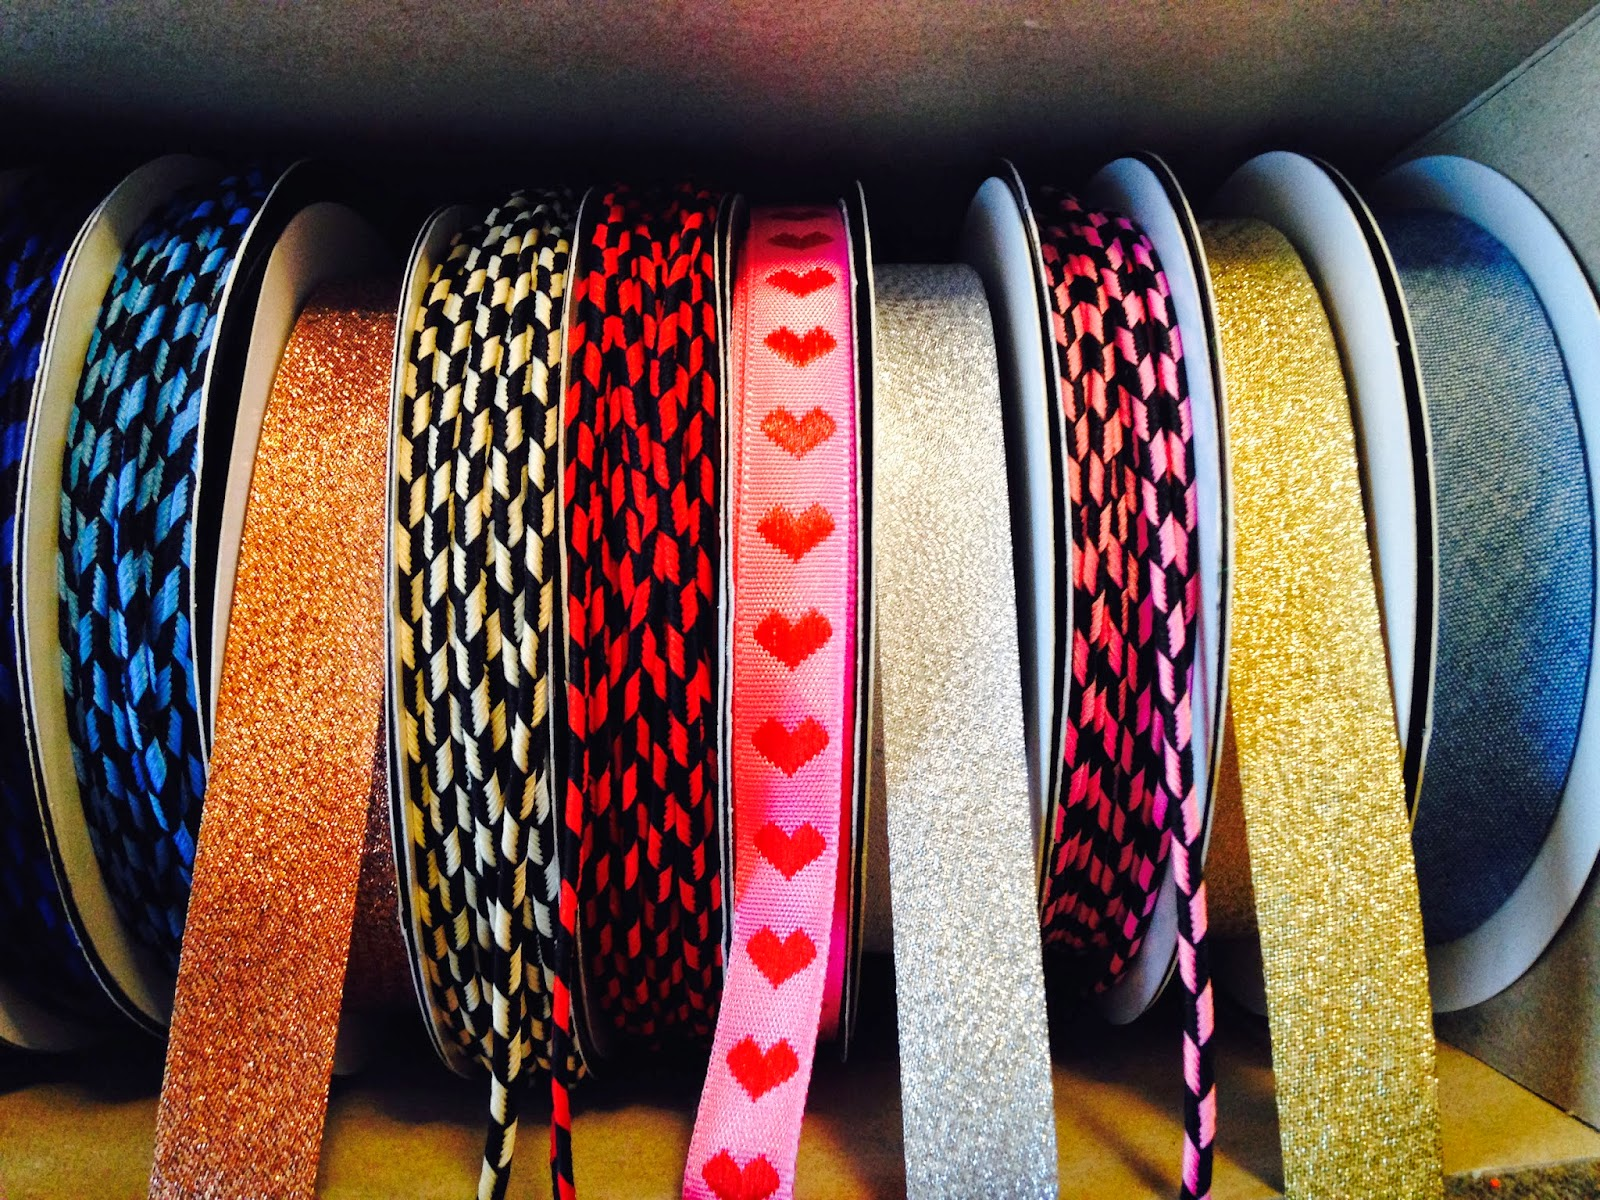 Anoraksnor lyseblå/sort - beige/sort - rød/sort - Lyserød/sort Skråbånd i kobber, gul og sølv Hjertebånd i pink med røde hjerter Skråbånd i denim/jeansstof/cowboystof